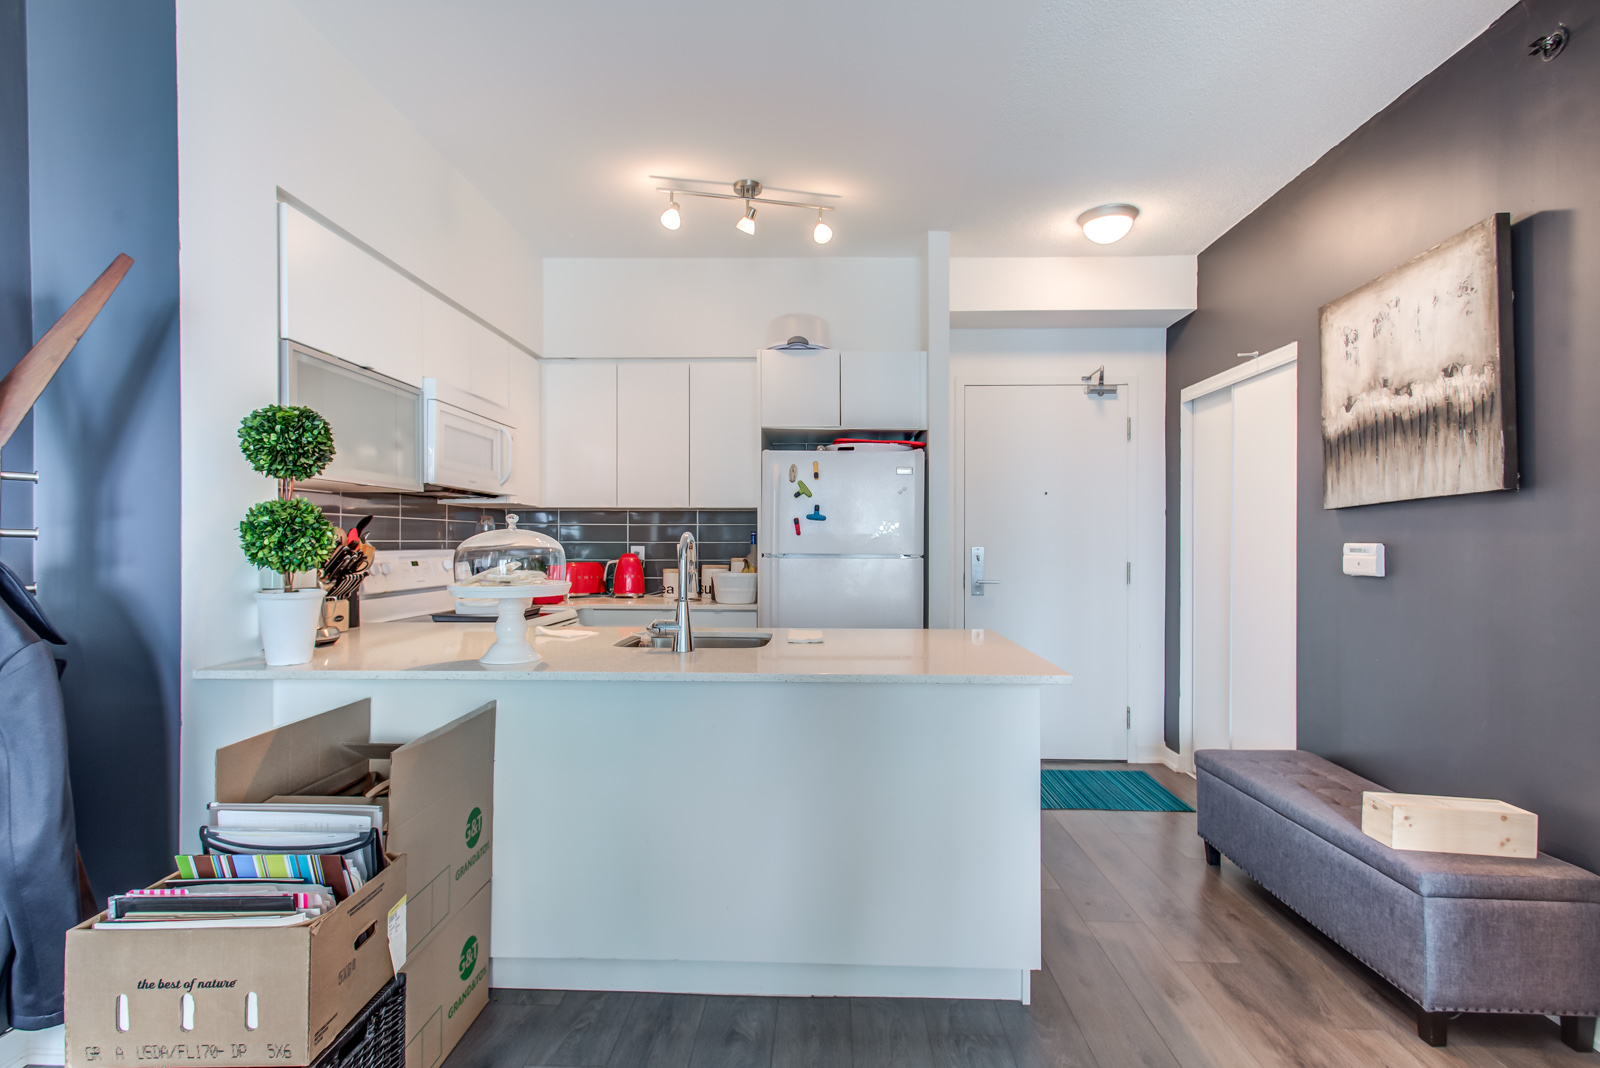 150 East Liberty St Unit 1616 kitchen.